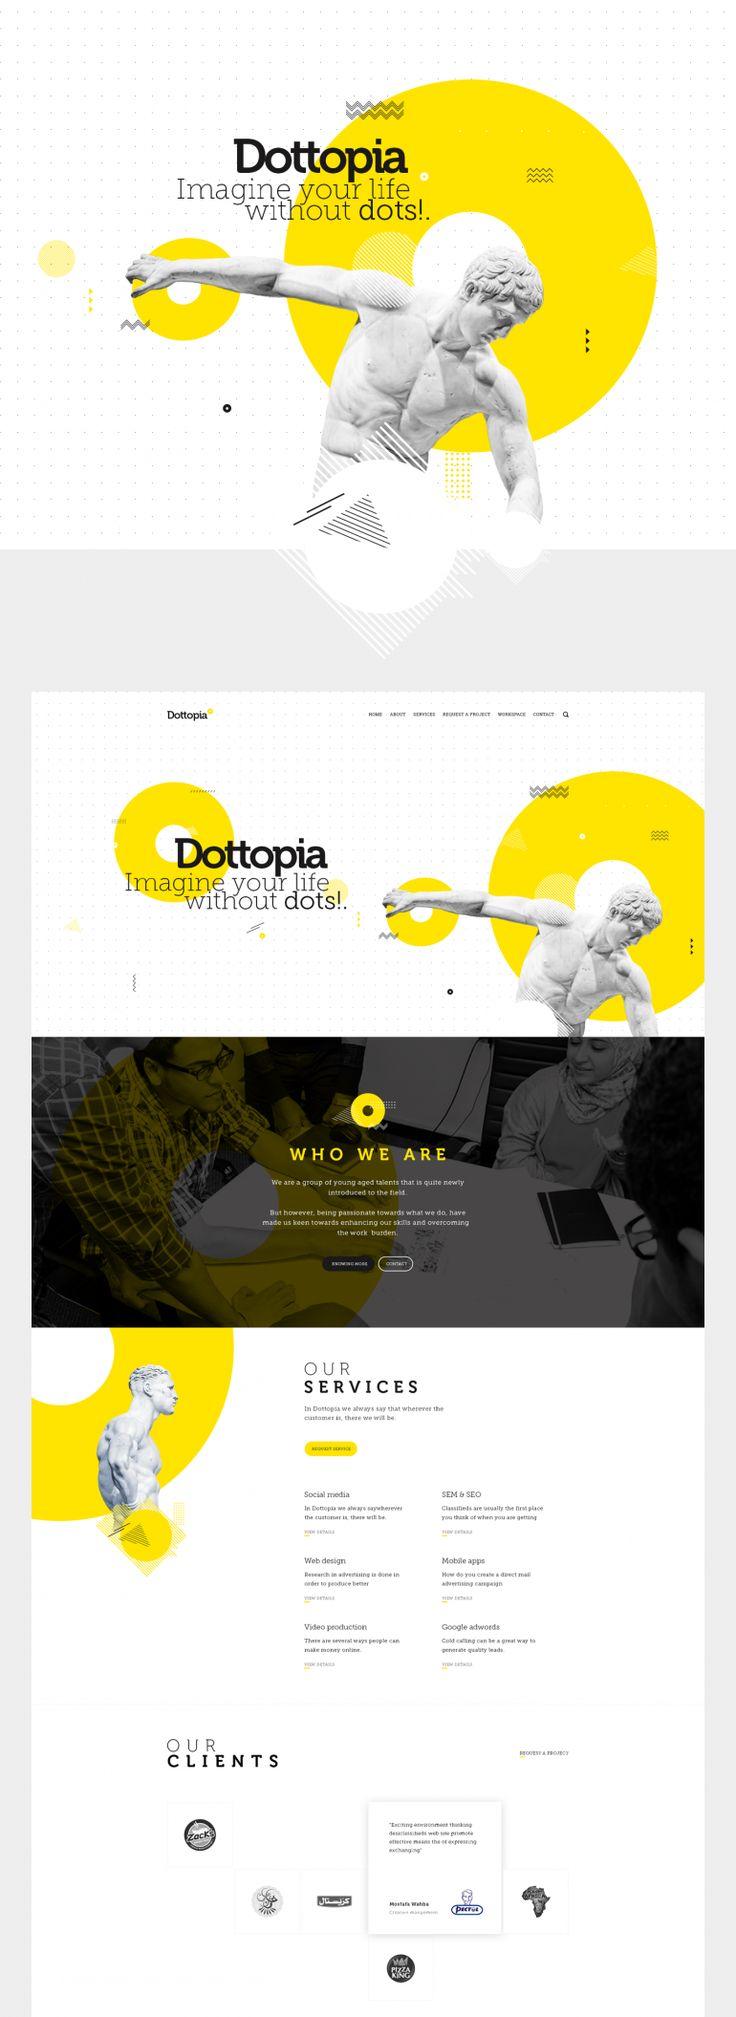 dottopia web design uxui - Designer Mobel Kollektion La Chance